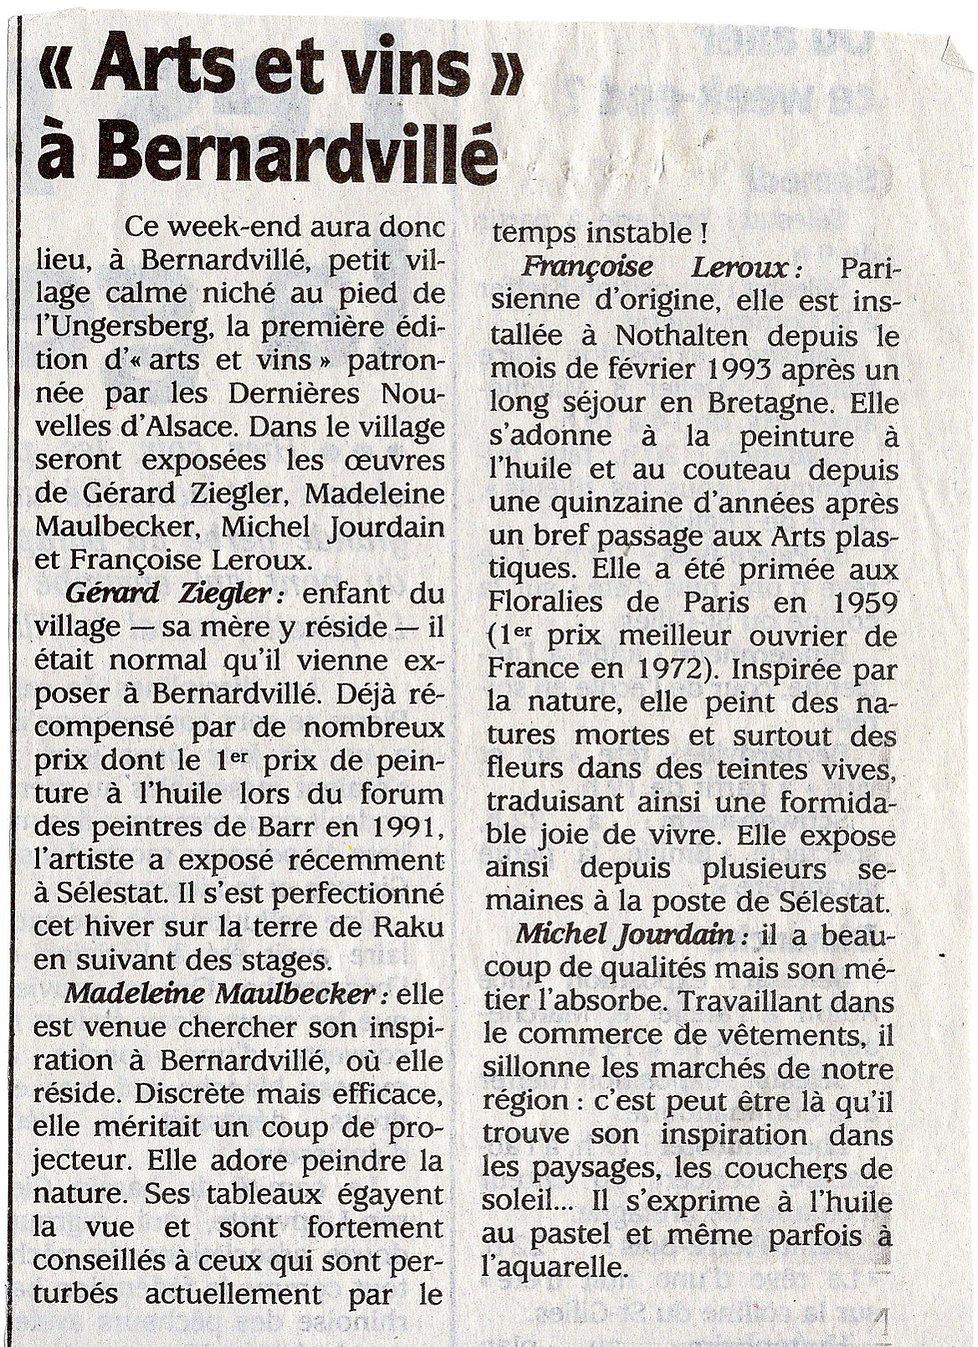 Arts et vins 24 25 juillet 1995 (Copier)